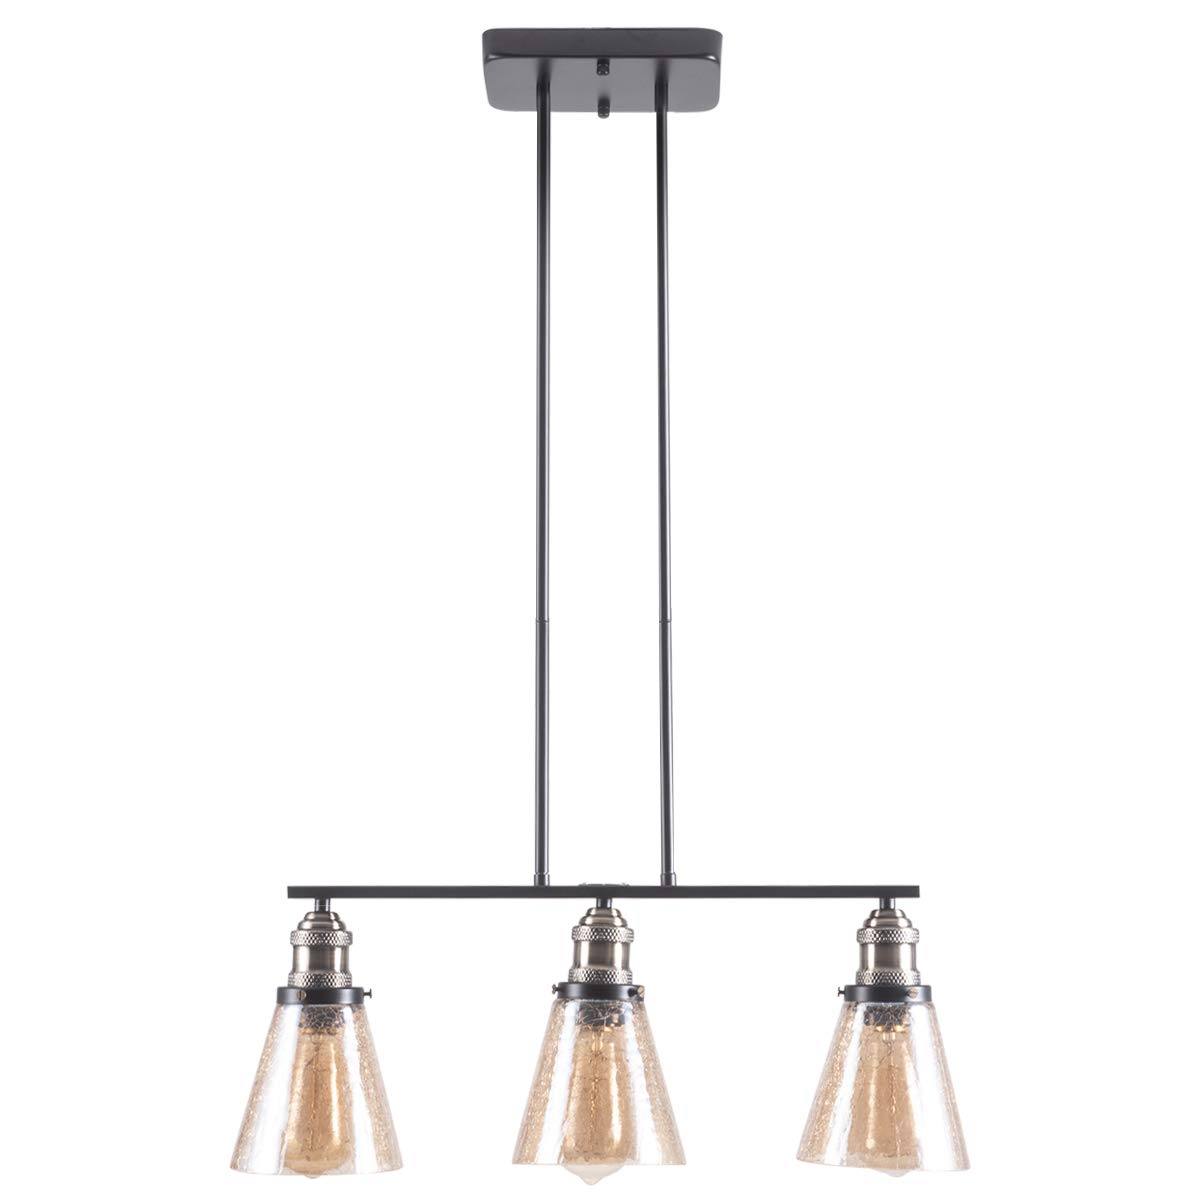 SHENGYADI 3-Light Amber Crackle Glass Pendant Lighting Modern Multi Kitchen Island Lighting Dining Room Lighting Fixtures Hanging